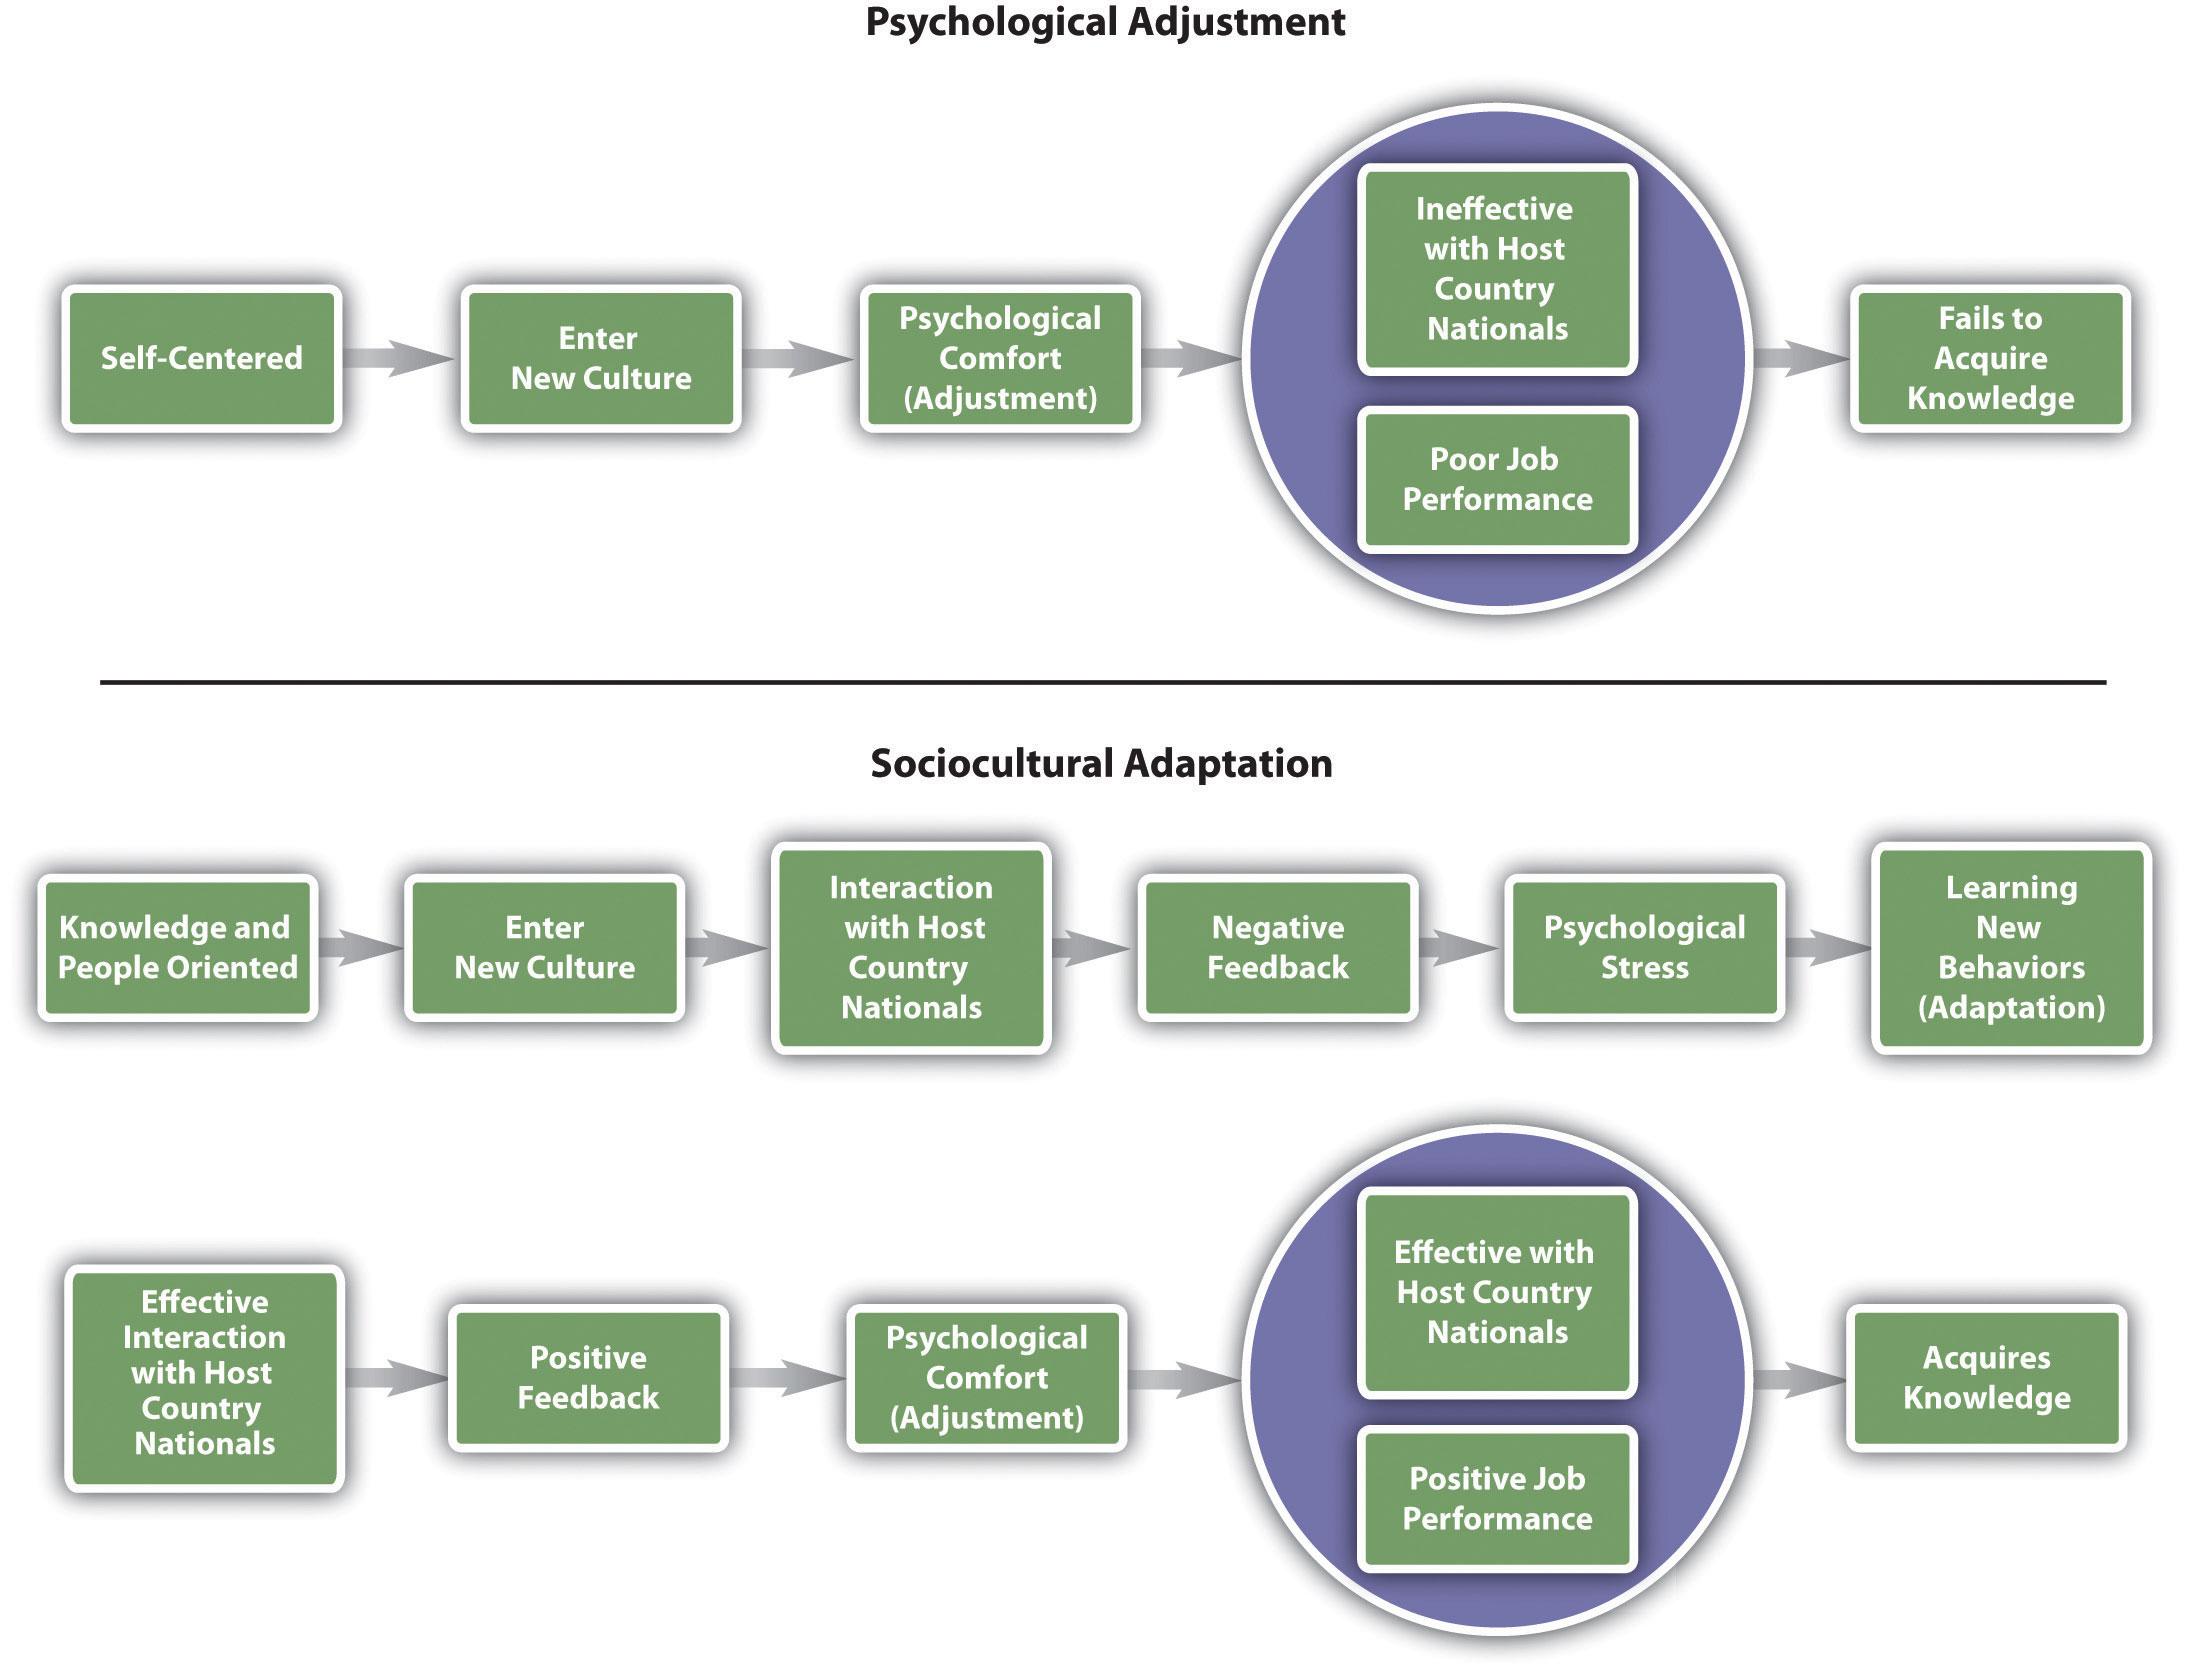 Blakeney's Model of Psychological versus Sociocultural Adaption